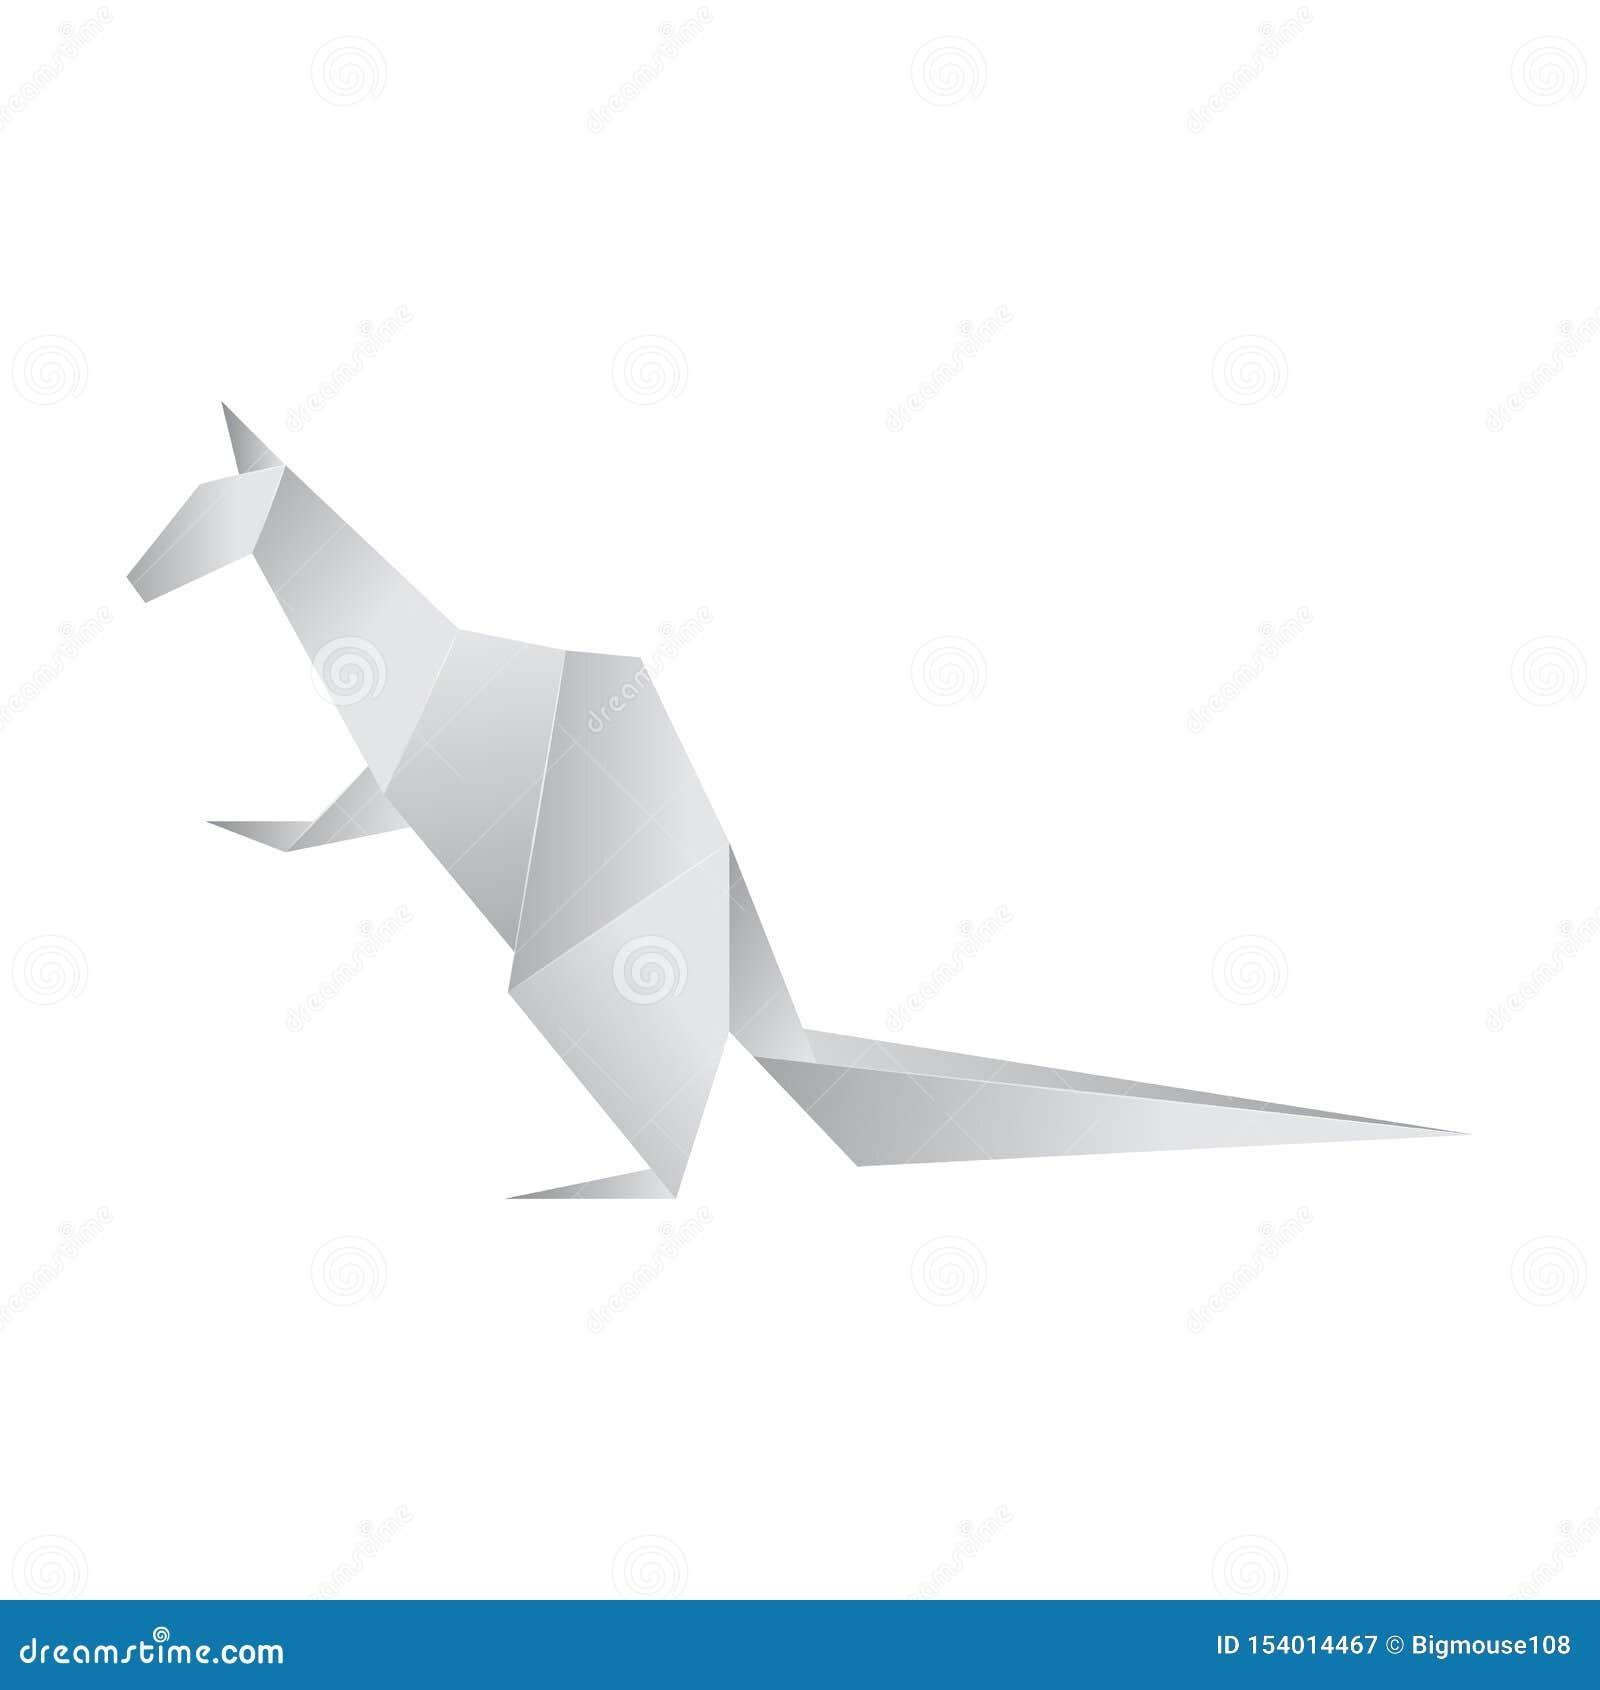 Realistic Detailed 3d Origami Paper Animal Kangaroo. Vector